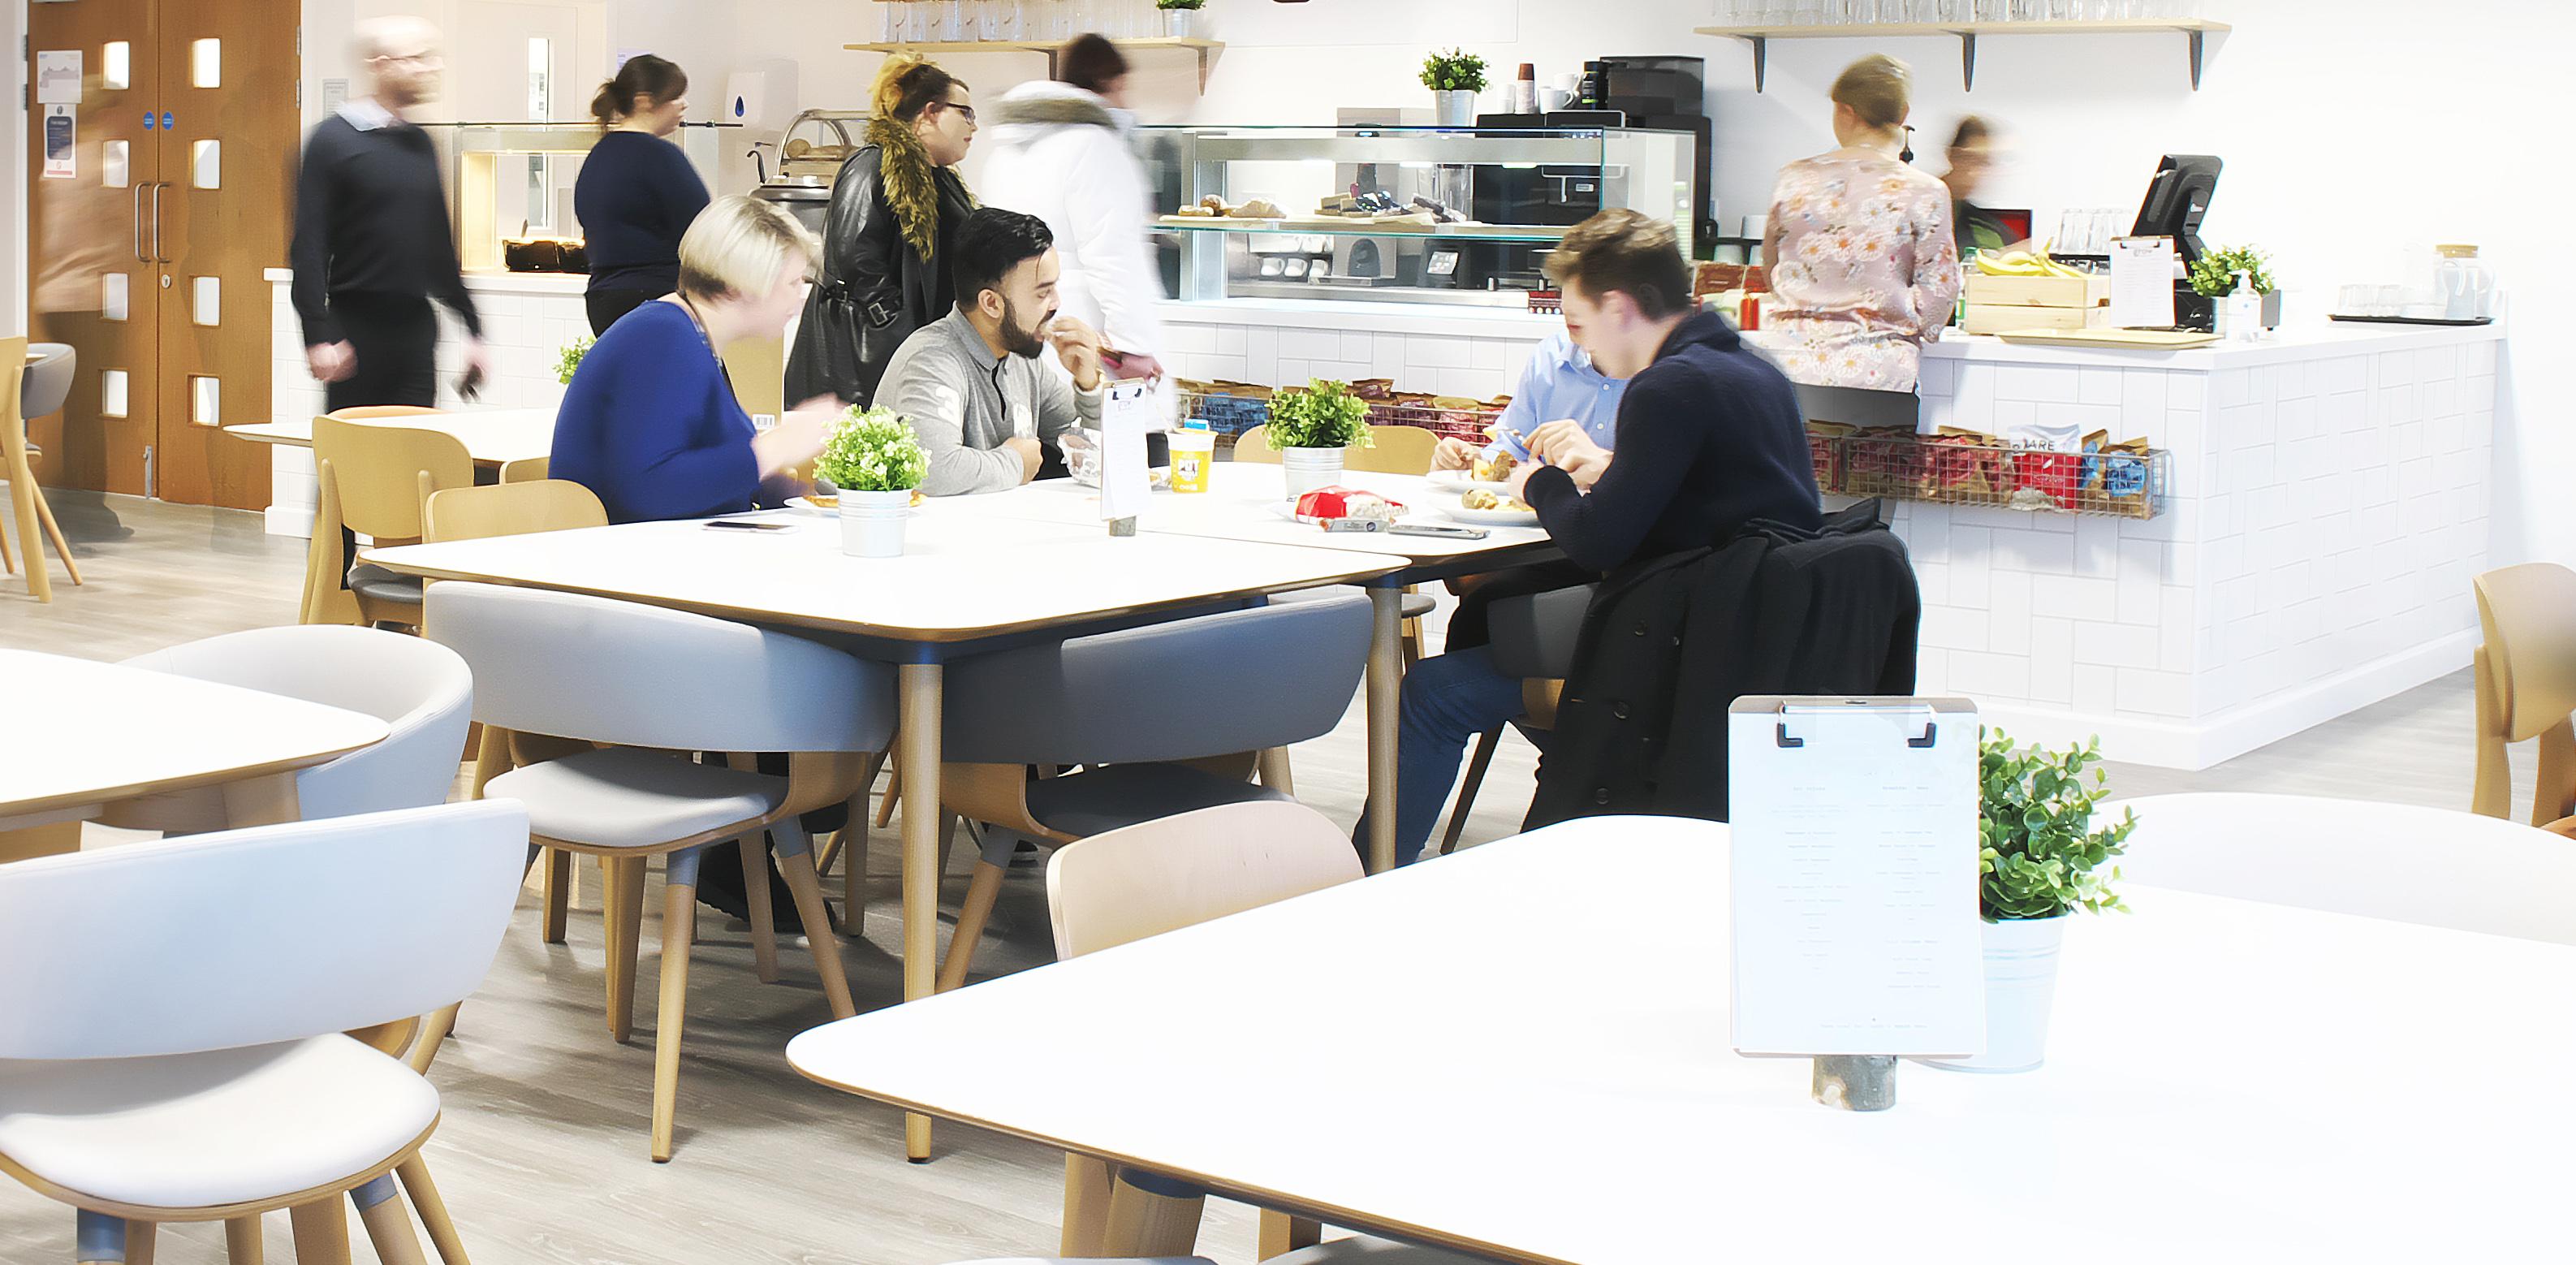 Origin8 teams up with Allia Future Business Centre Peterborough as catering partner